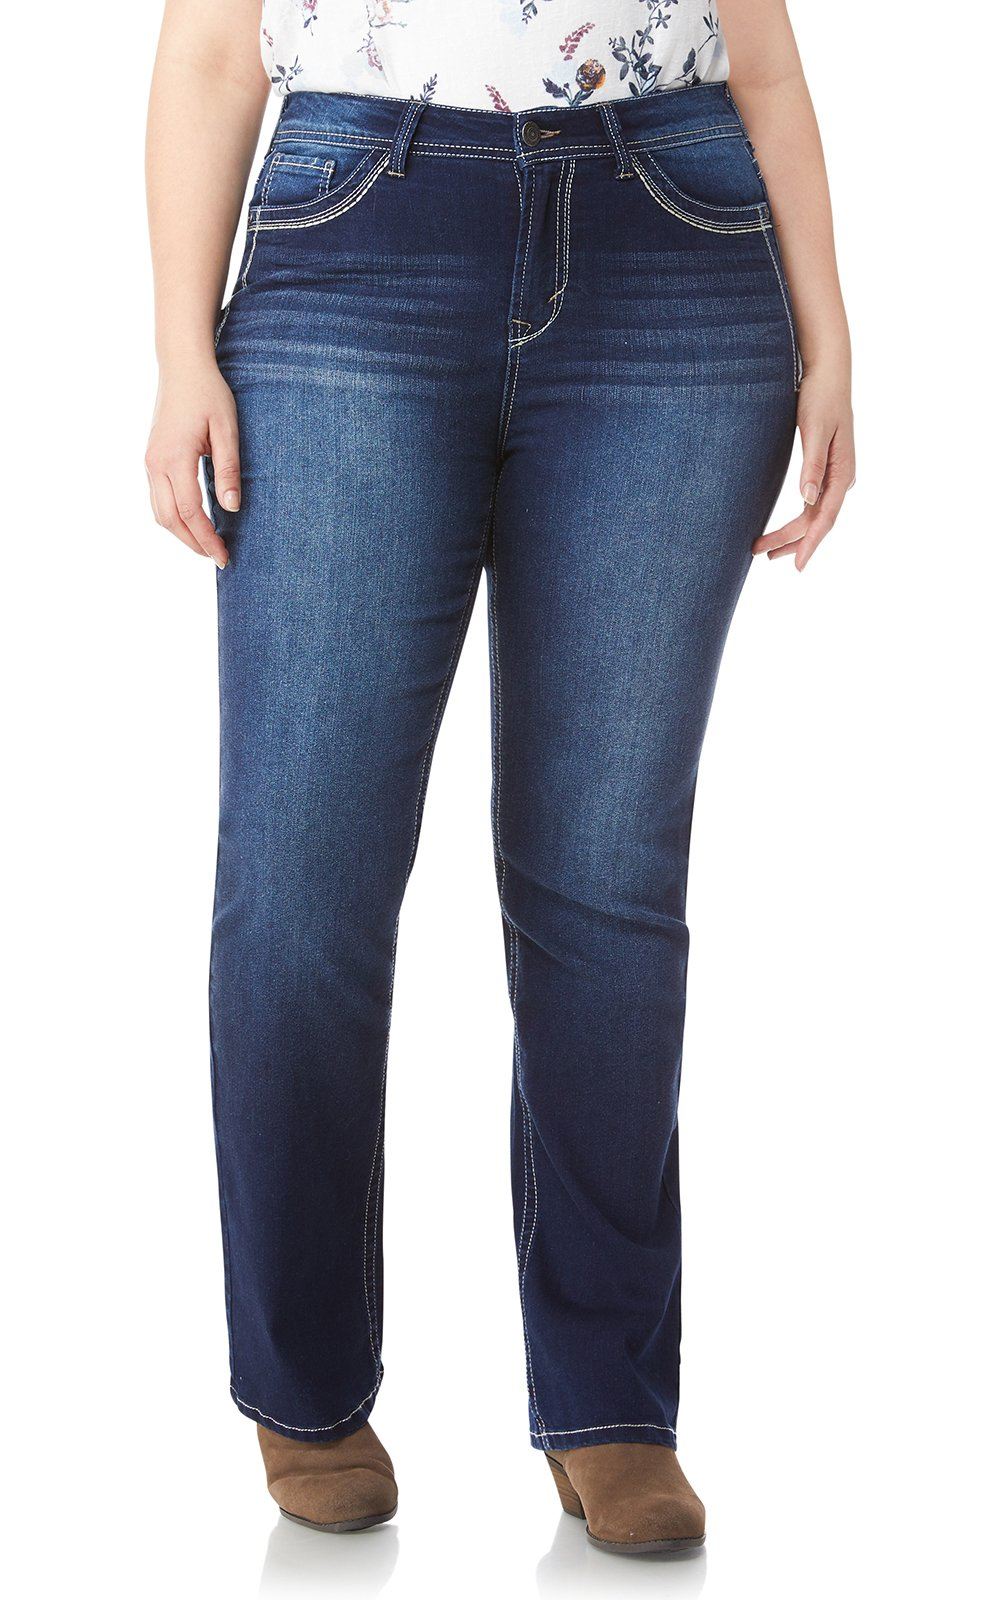 WallFlower Women's Juniors Plus-Size Classic Legendary Bootcut Jeans in Amy, 18 Plus